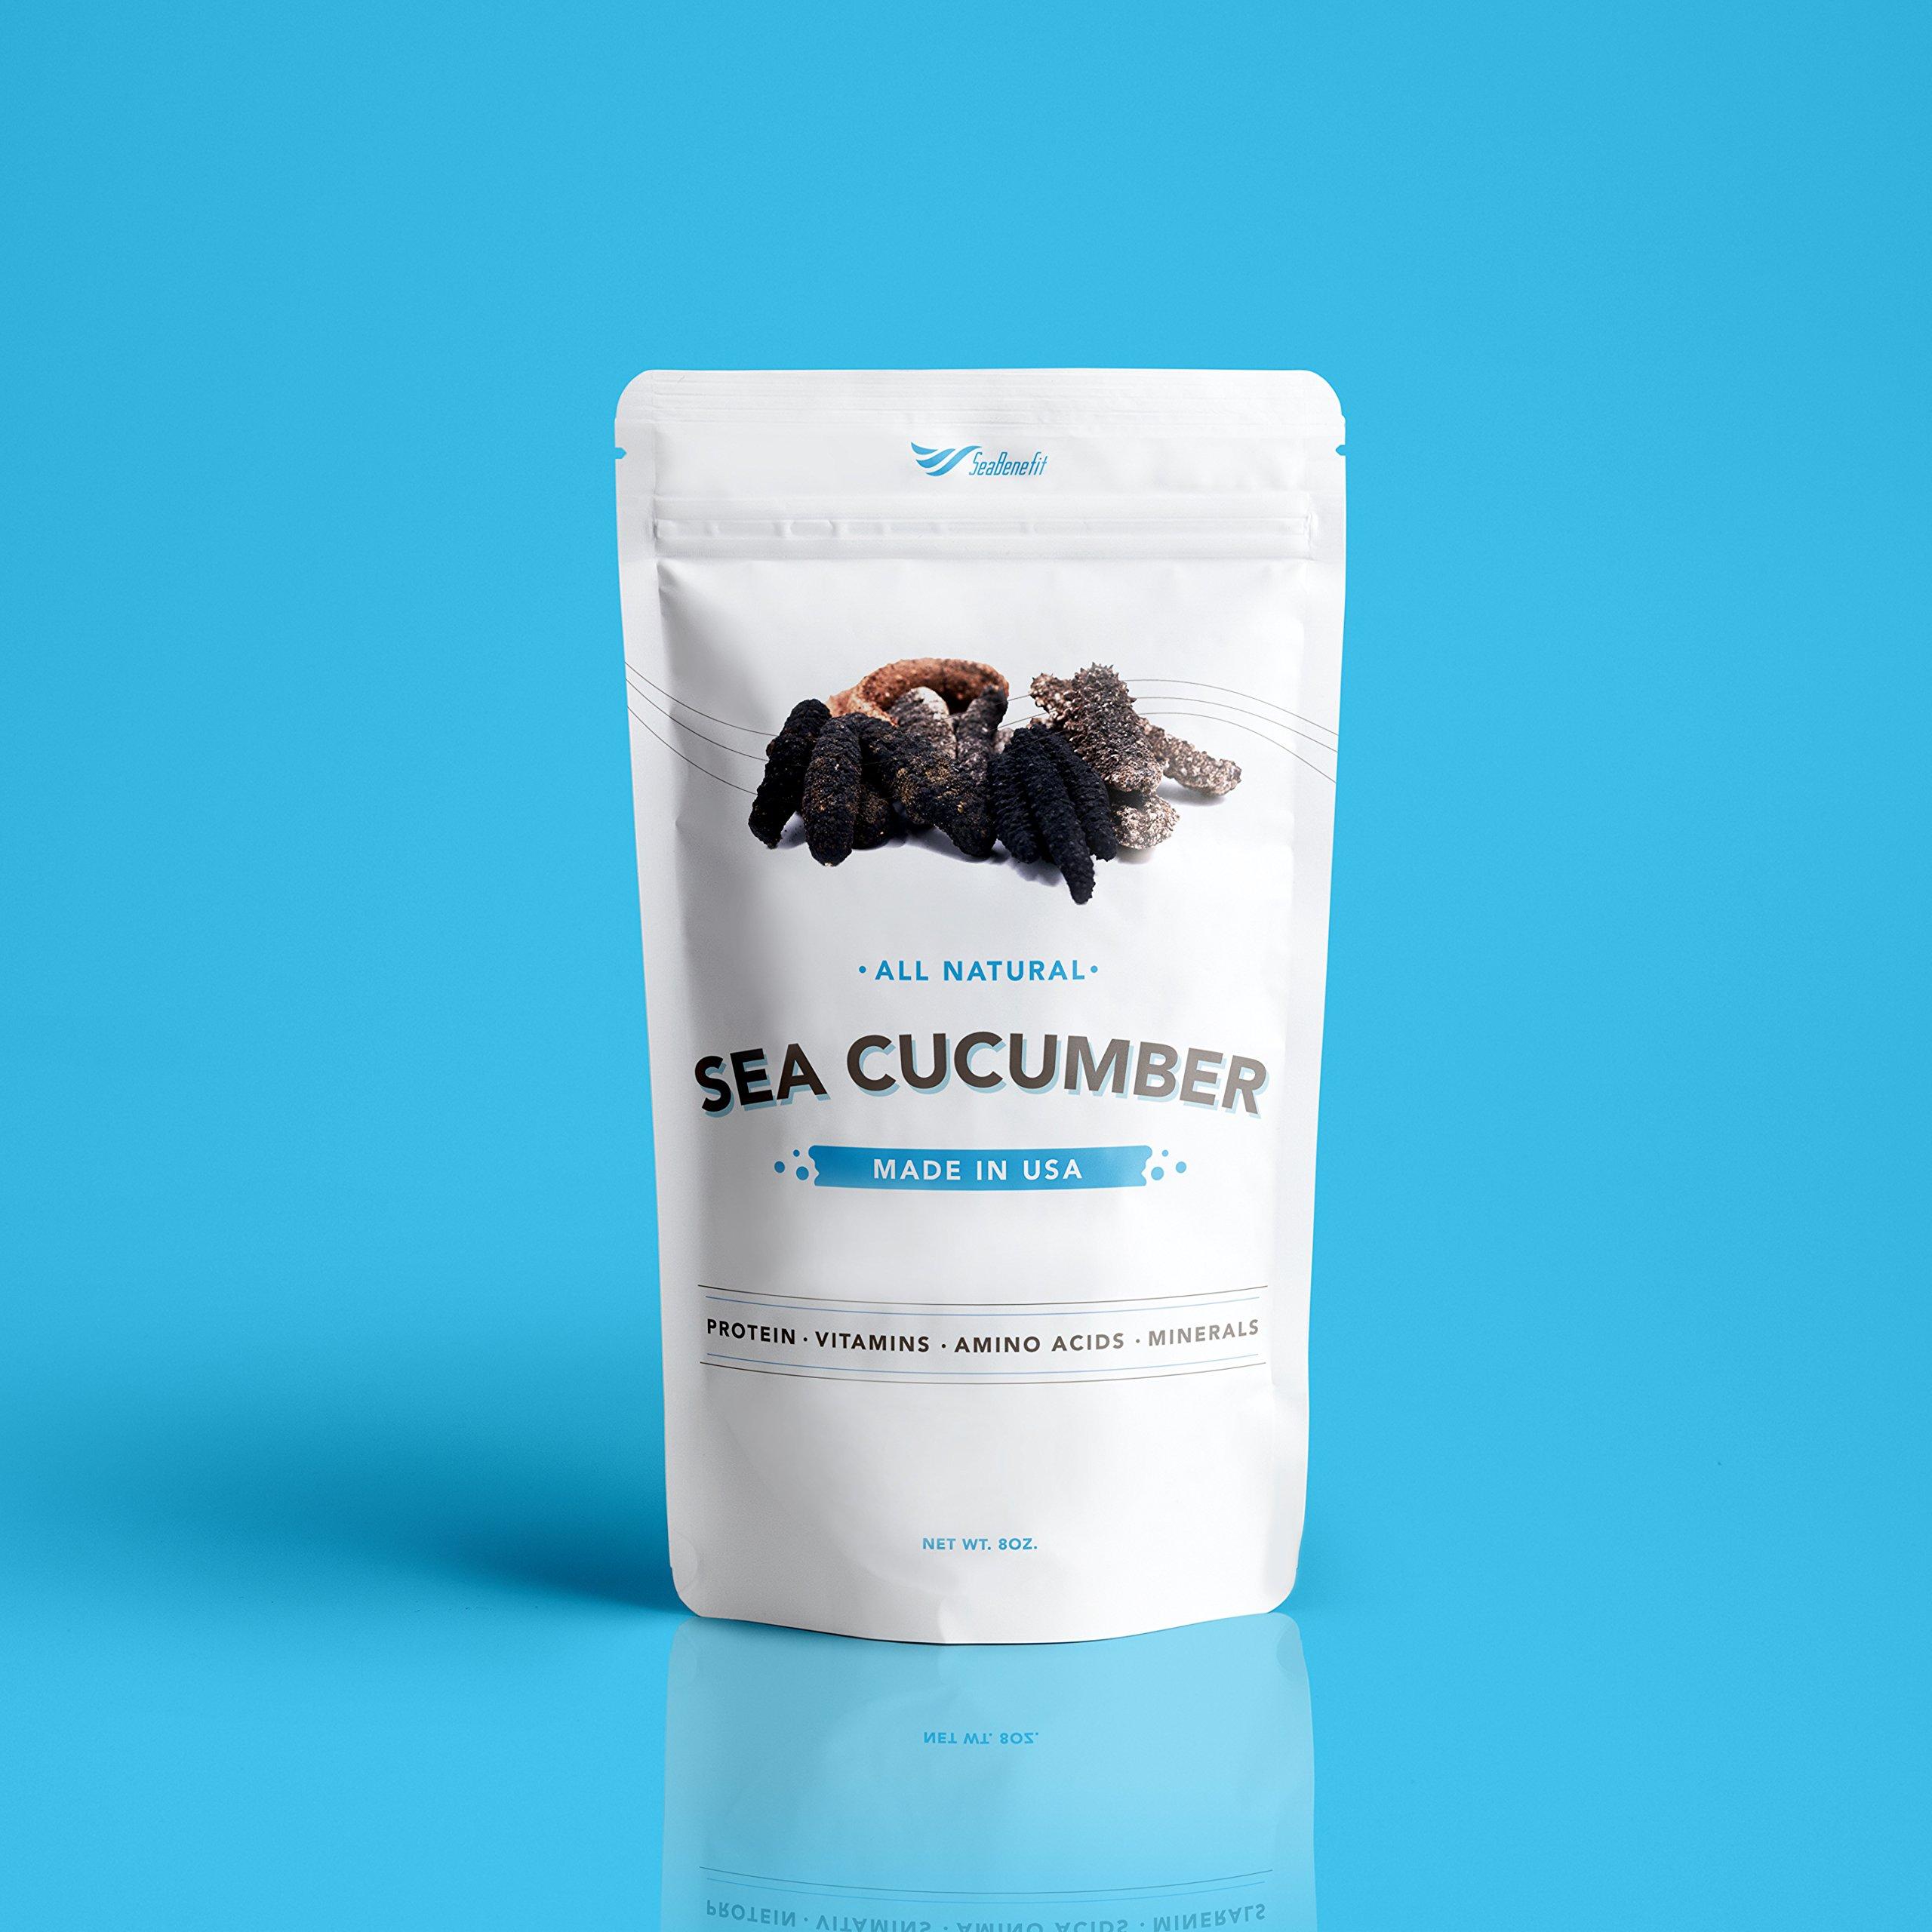 SB Organics Alaskan Red Large - Wild Caught Sea Cucumber Dried All Natural Nutritious - 8 oz. by SB Organics (Image #2)